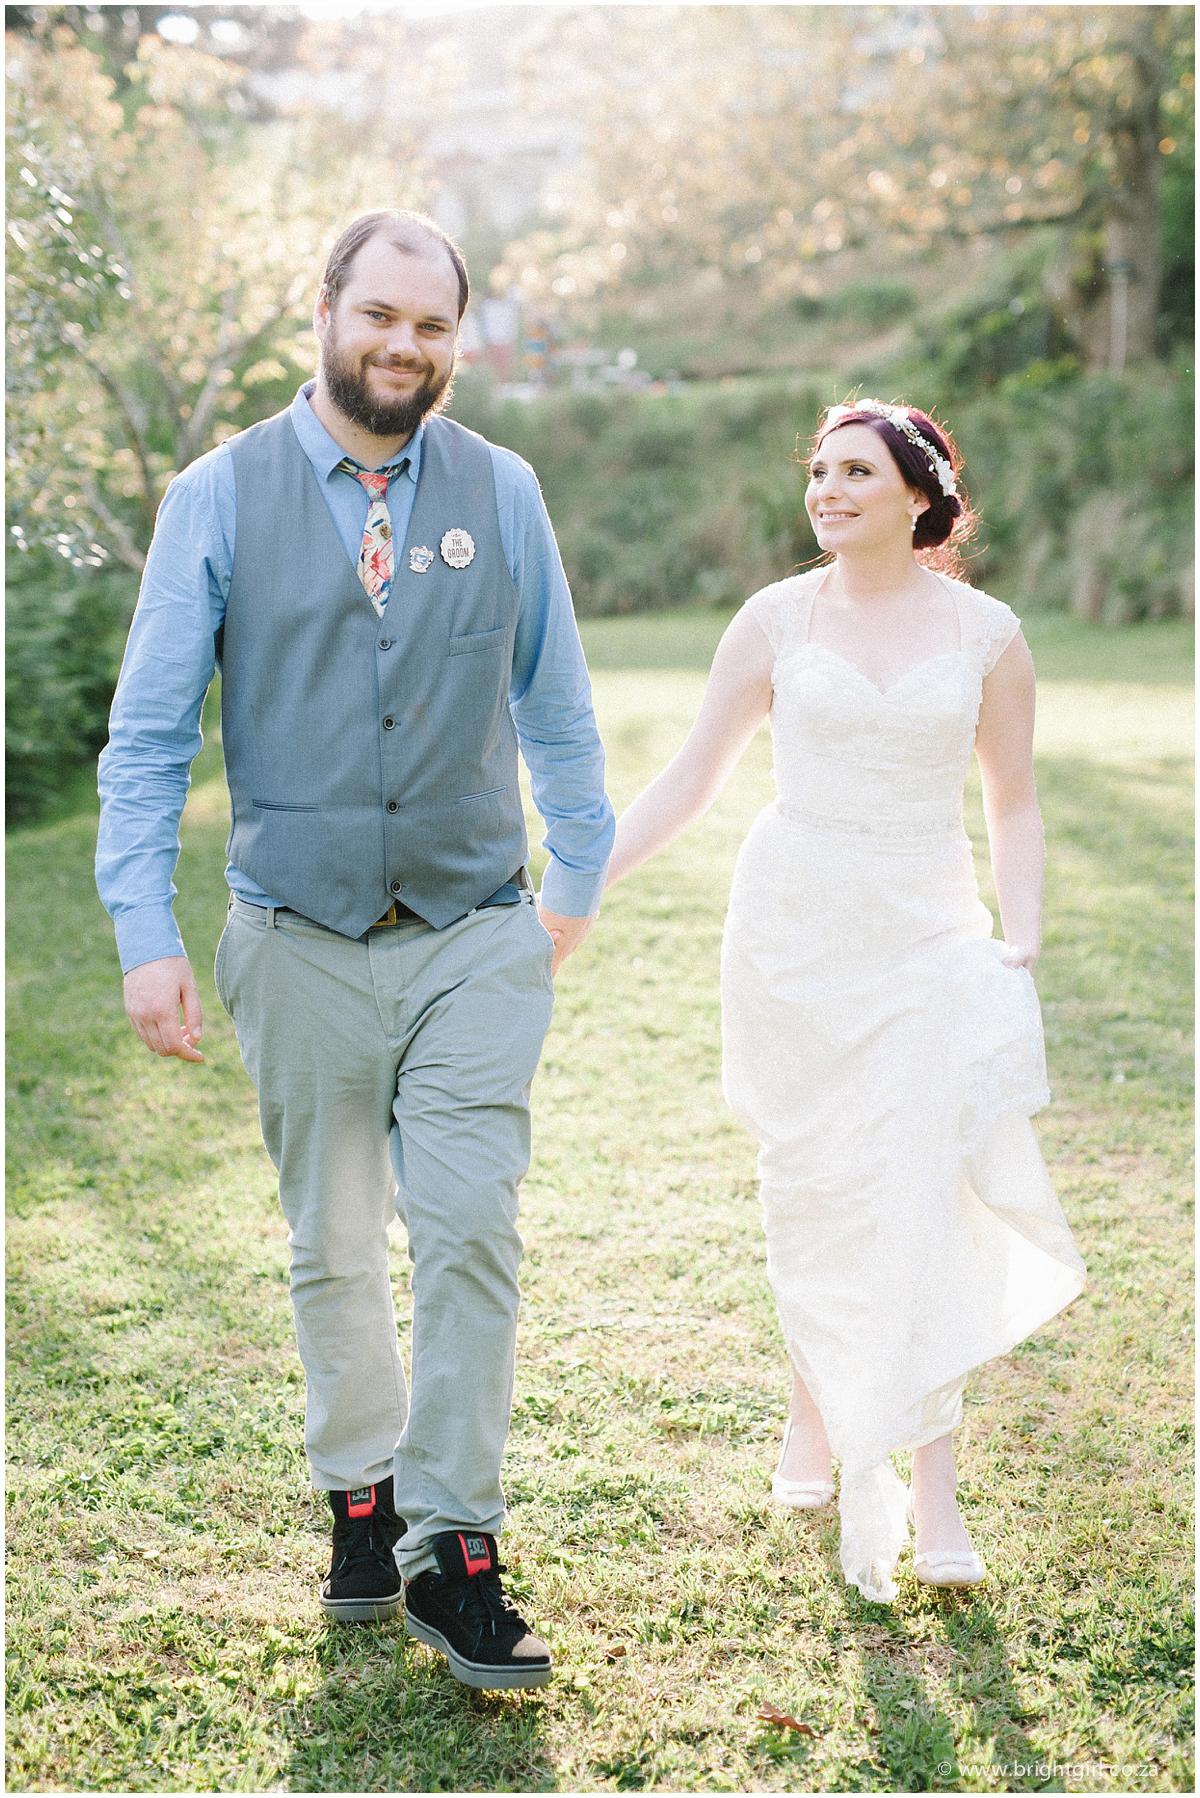 brightgirl_talloula_wedding59